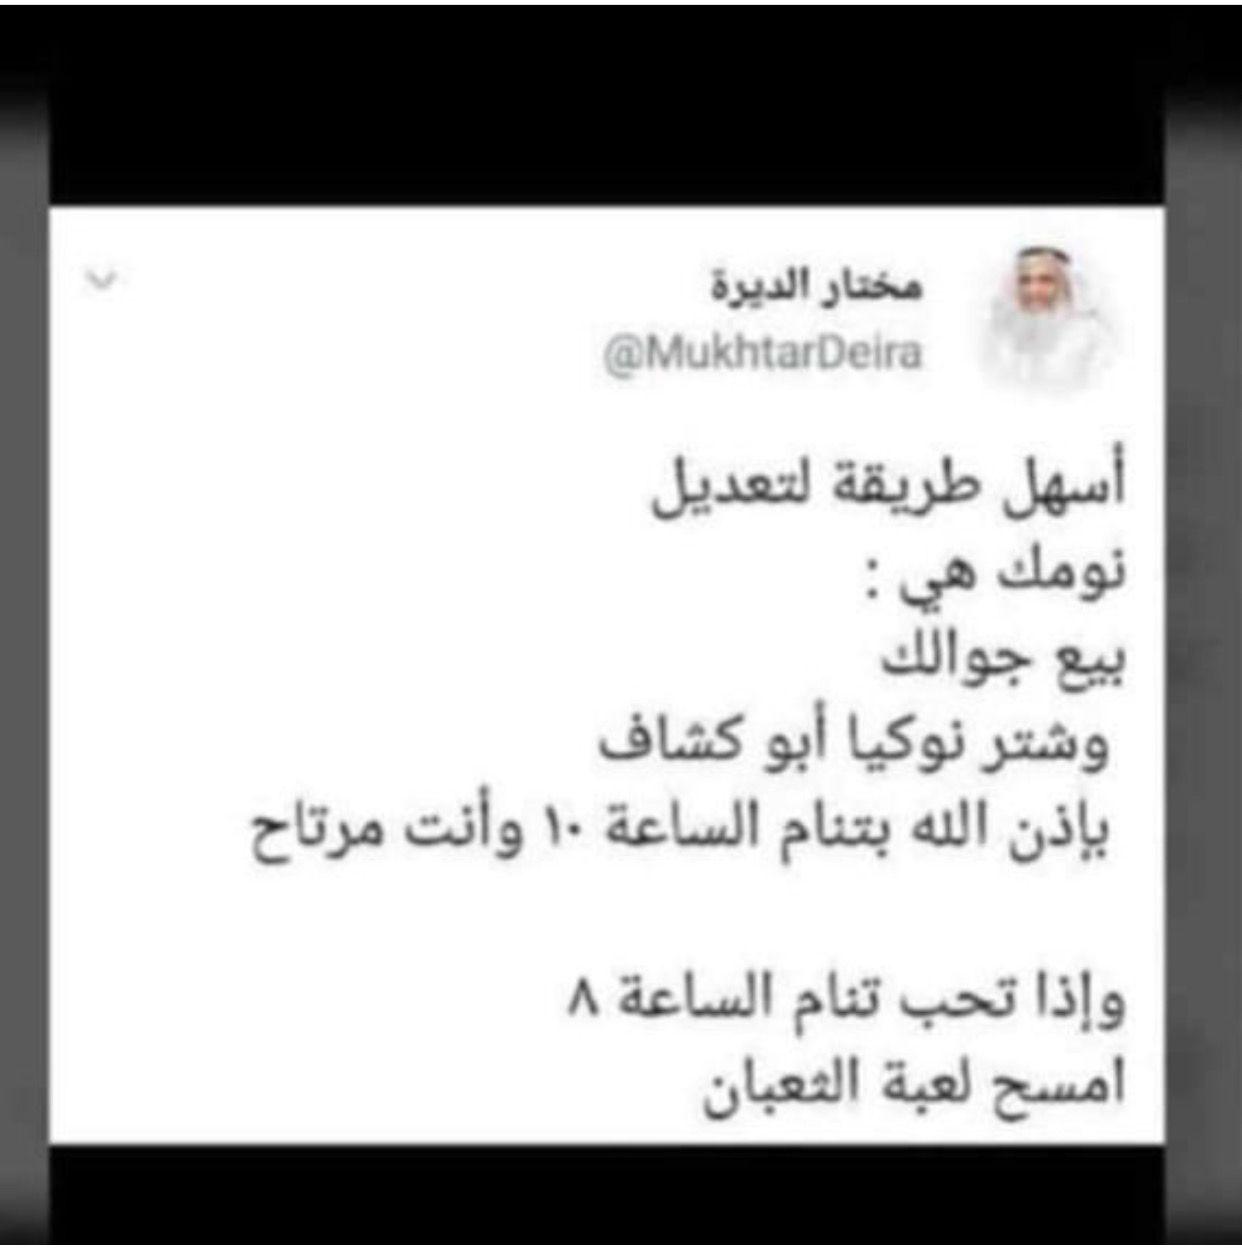 Pin By خليفه On كلمات Math Math Equations Calligraphy